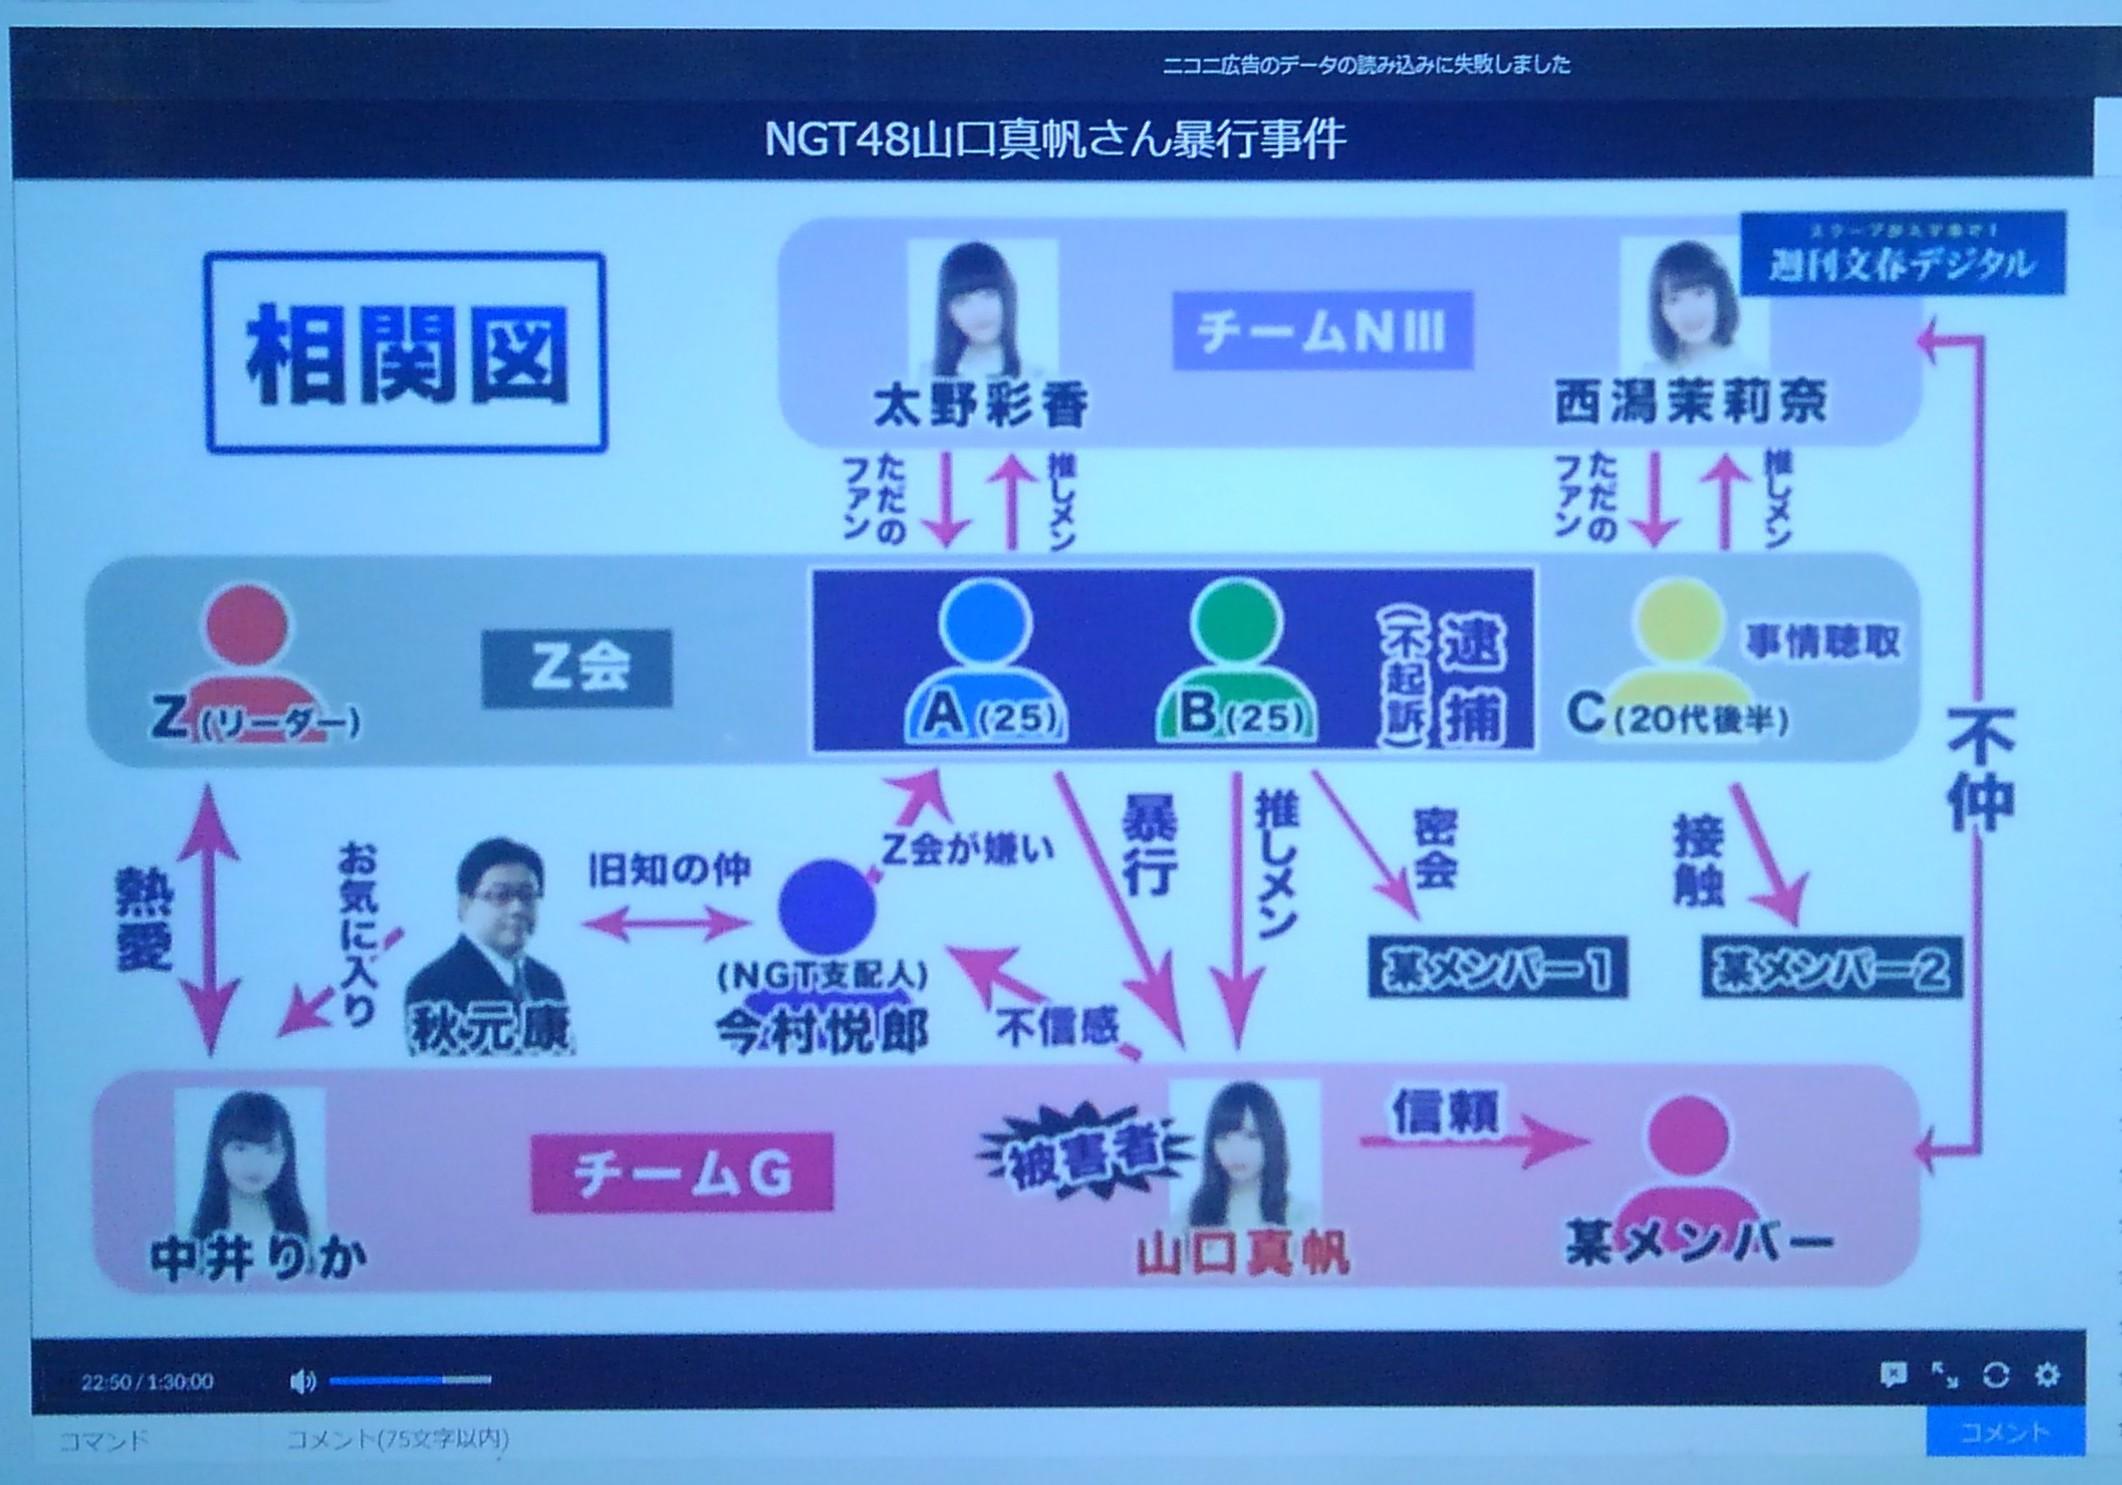 週刊文春ライブ NGT48山口真帆暴行事件 相関図